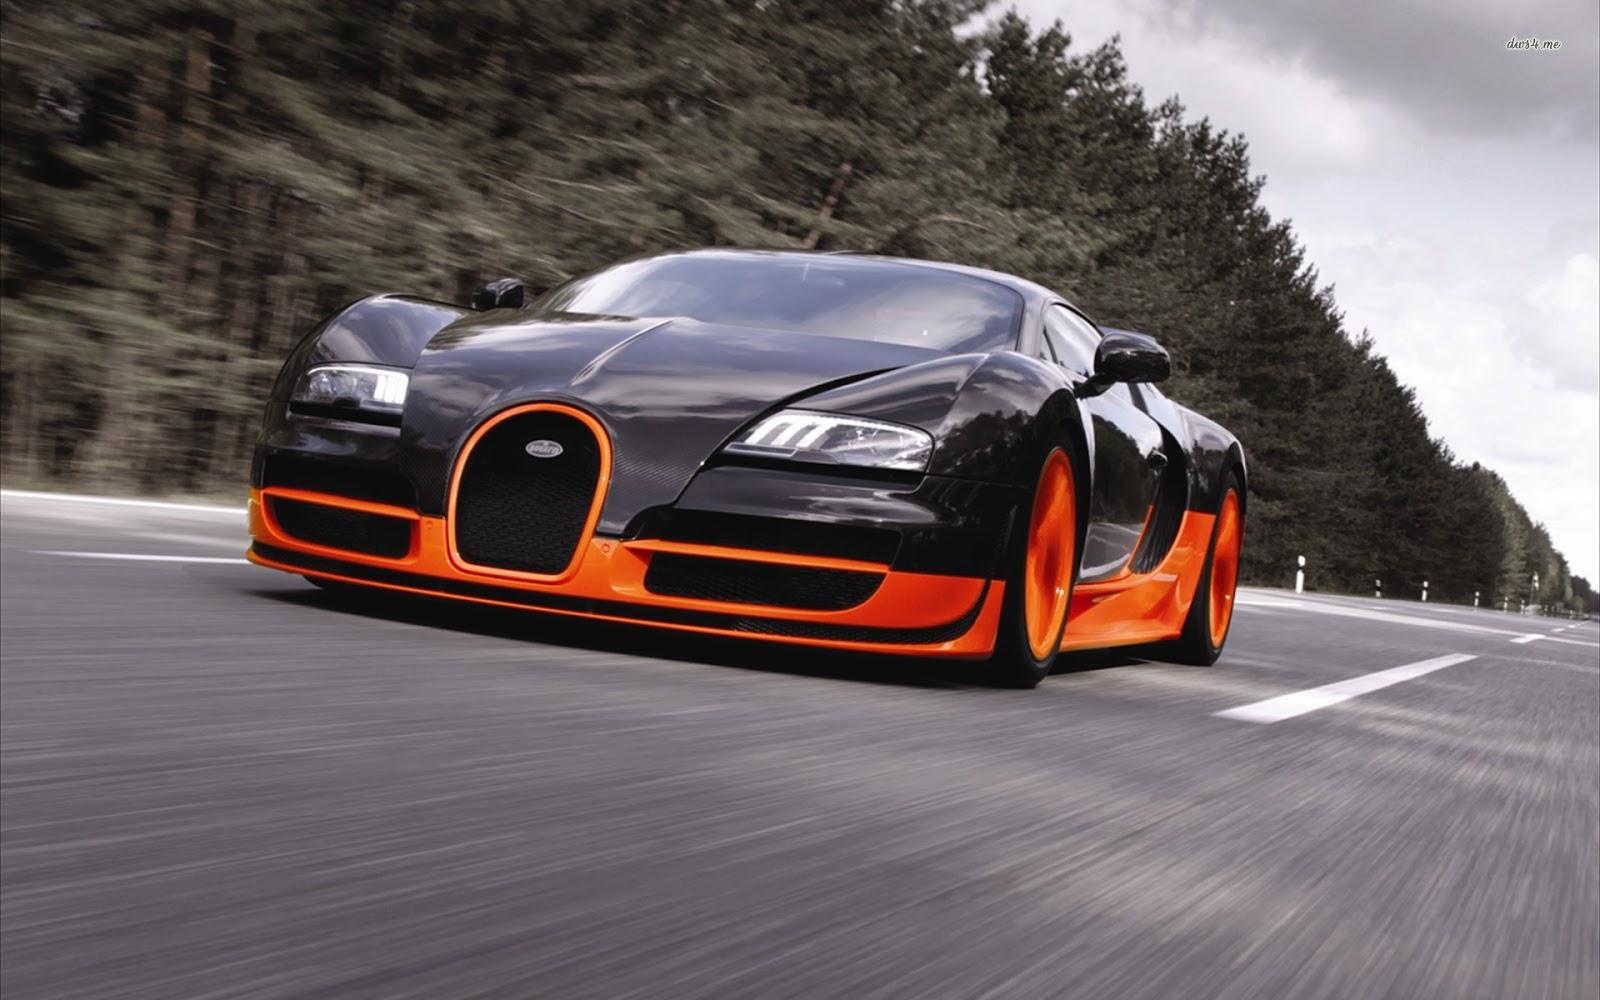 bugatti veyron hd wallpaper bugatti veyron hd wallpaper bugatti veyron. Cars Review. Best American Auto & Cars Review